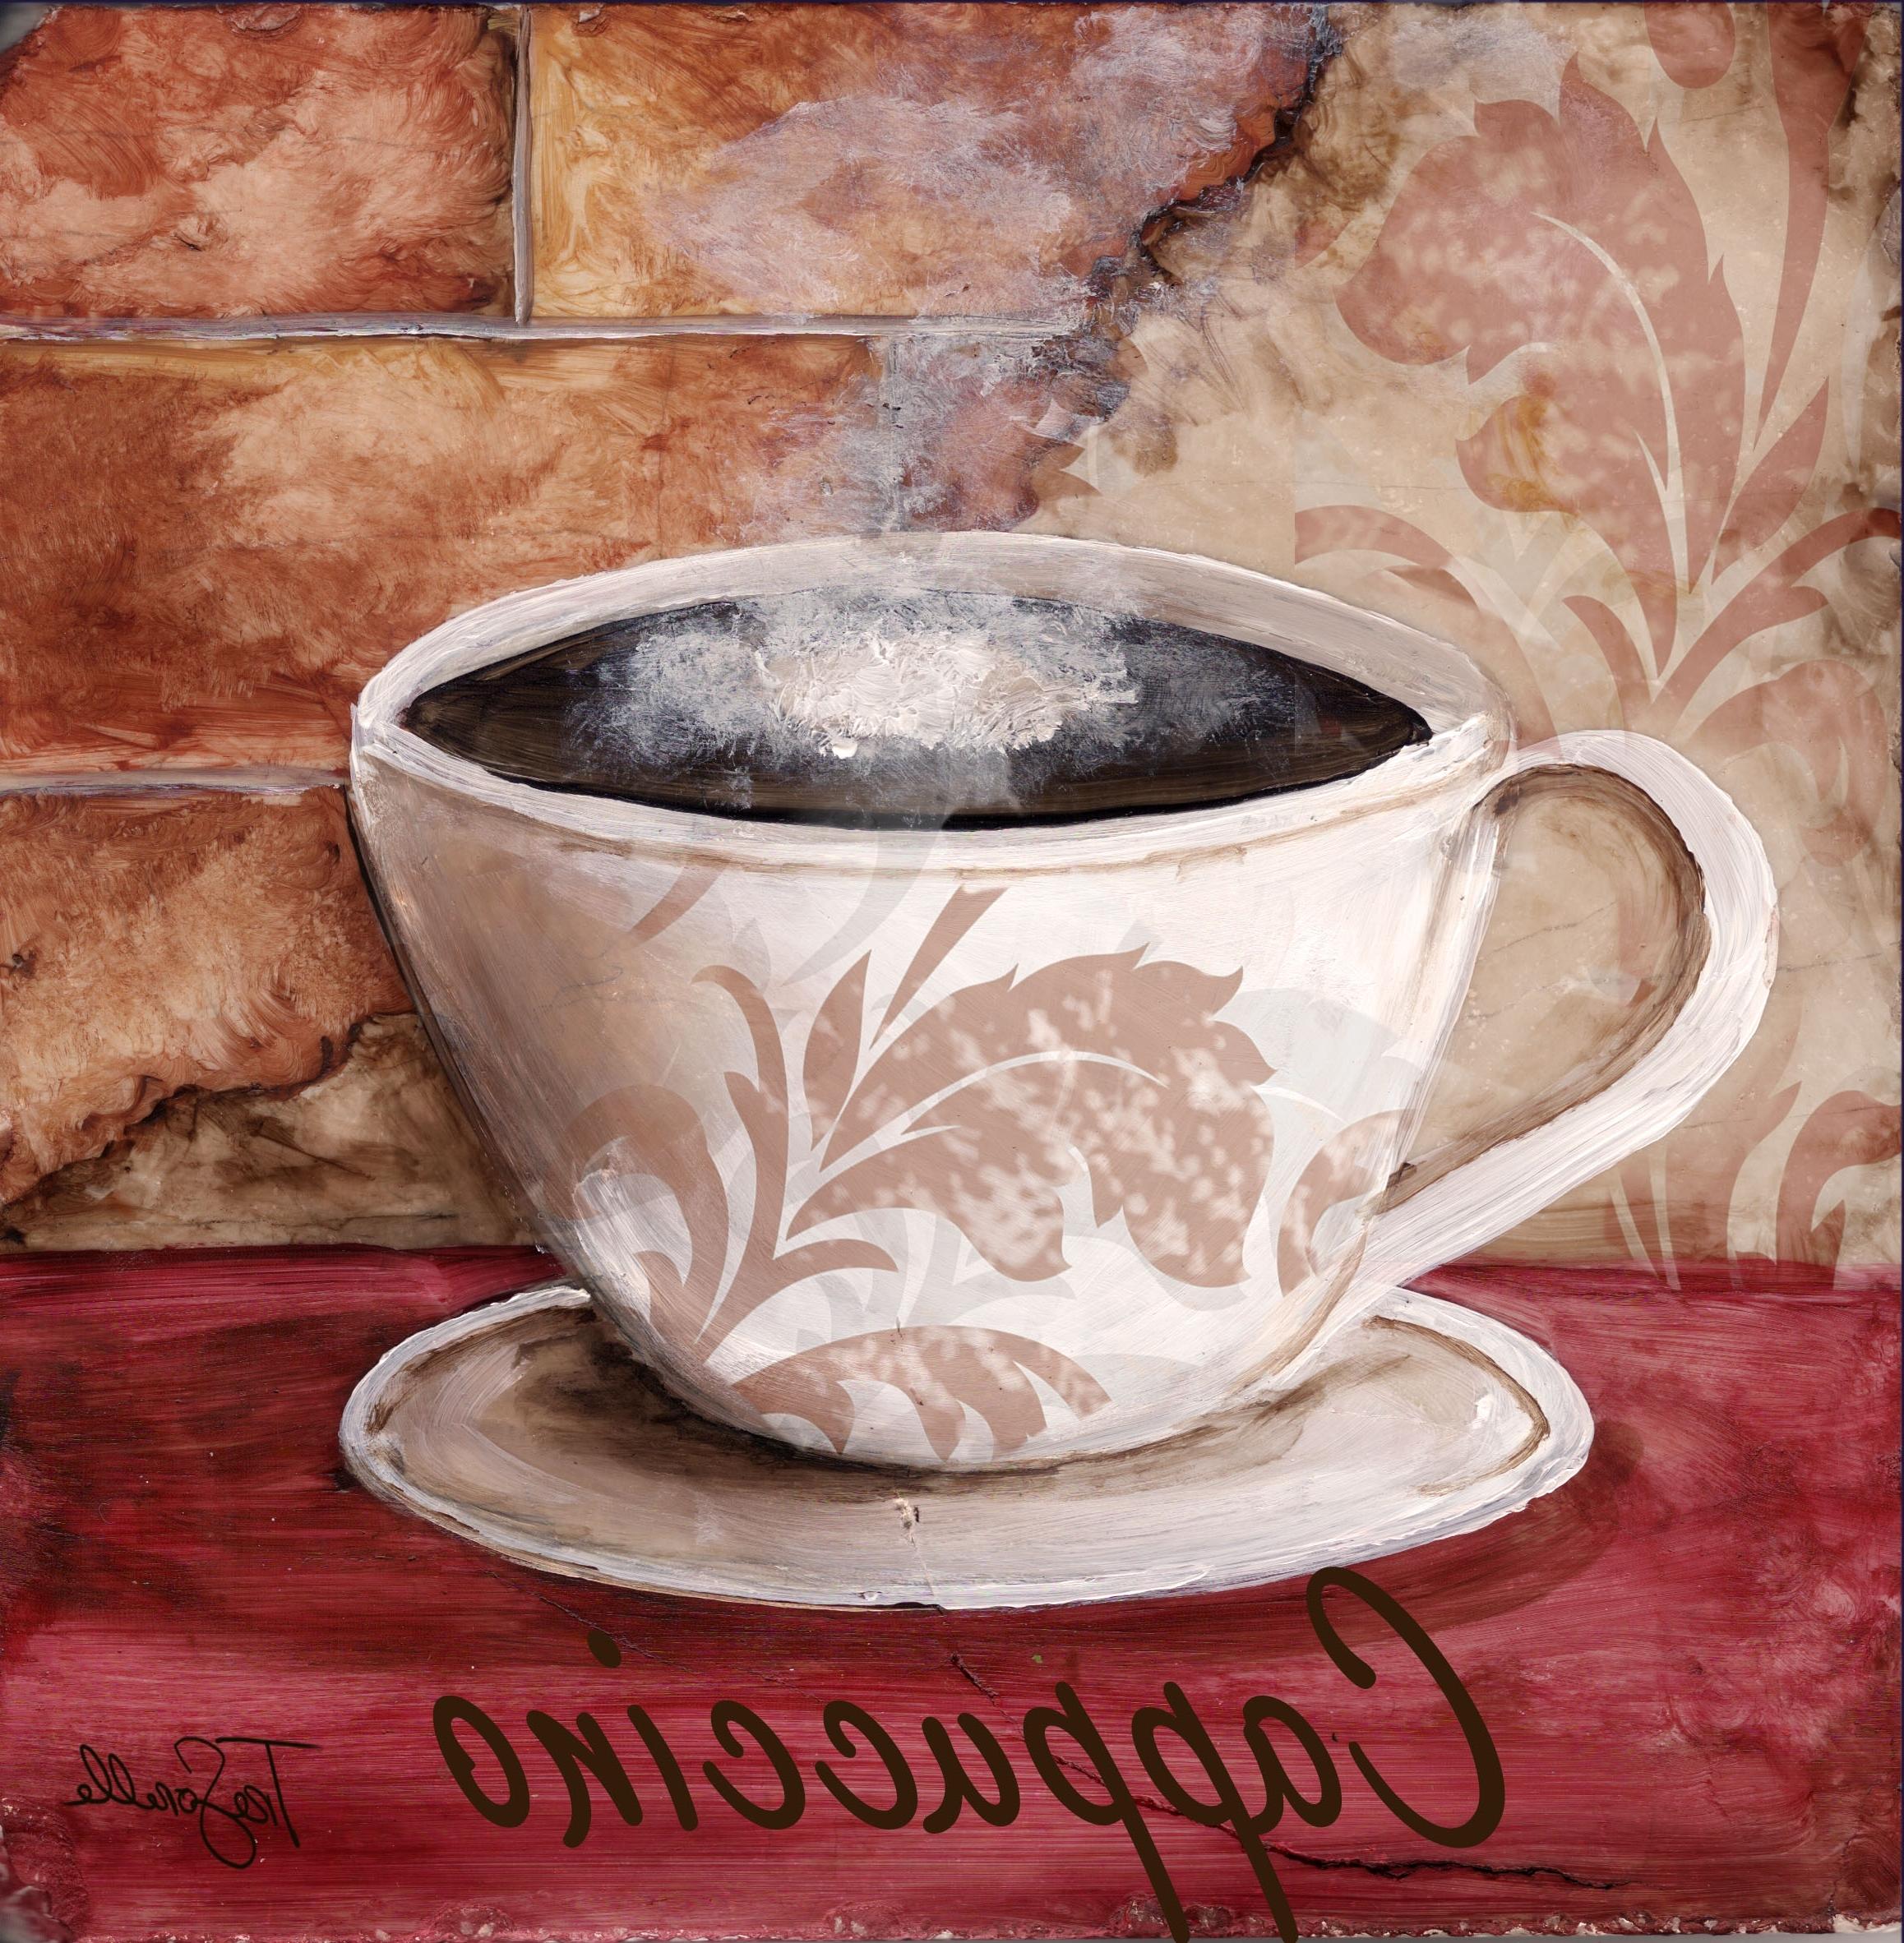 2018 Tre Sorelle's Art Licensing Program Regarding Italian Coffee Wall Art (View 1 of 15)